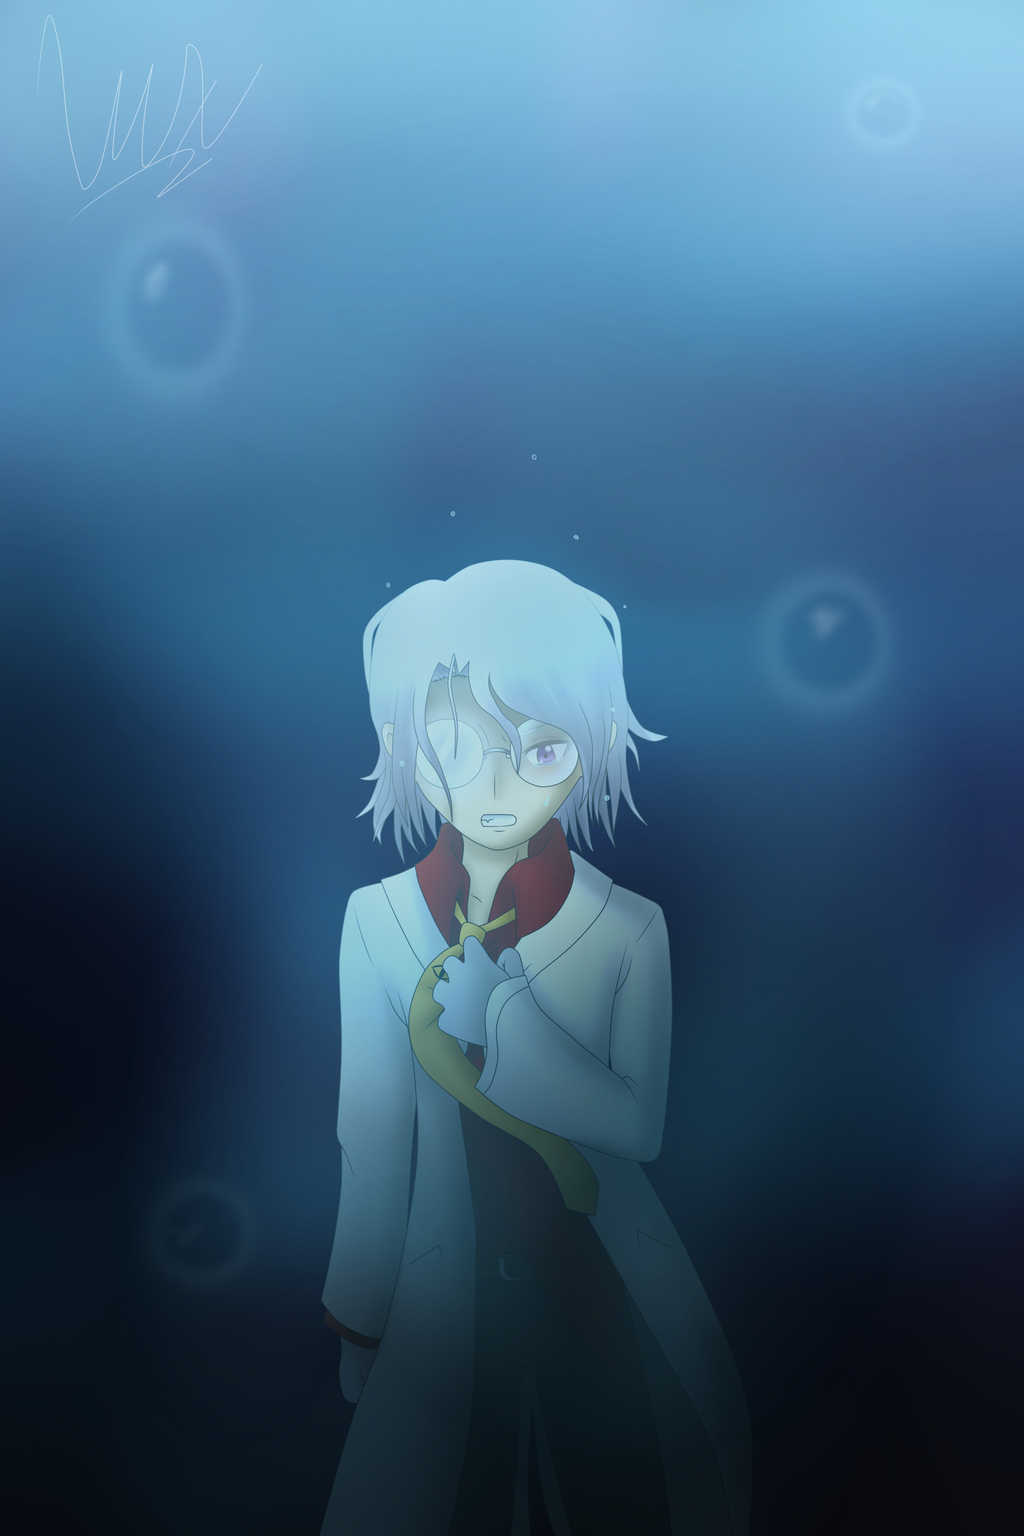 [TOA] Drowning